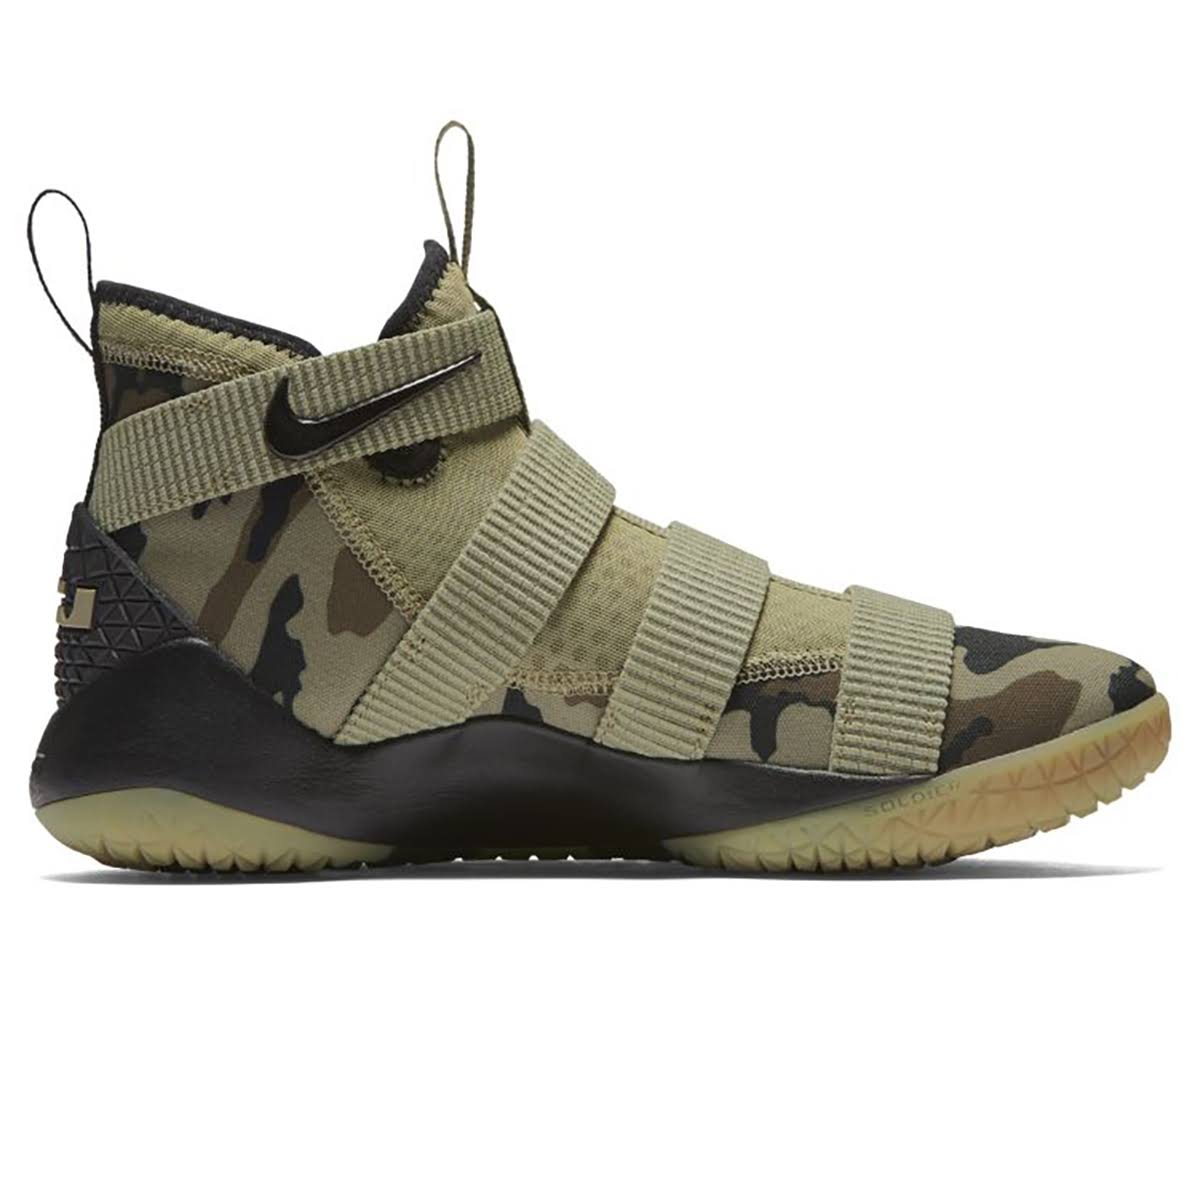 11 Nike Soldier Hasel Basketballschuhe Lebron Olive Neutral Herren rrS1cEUBy